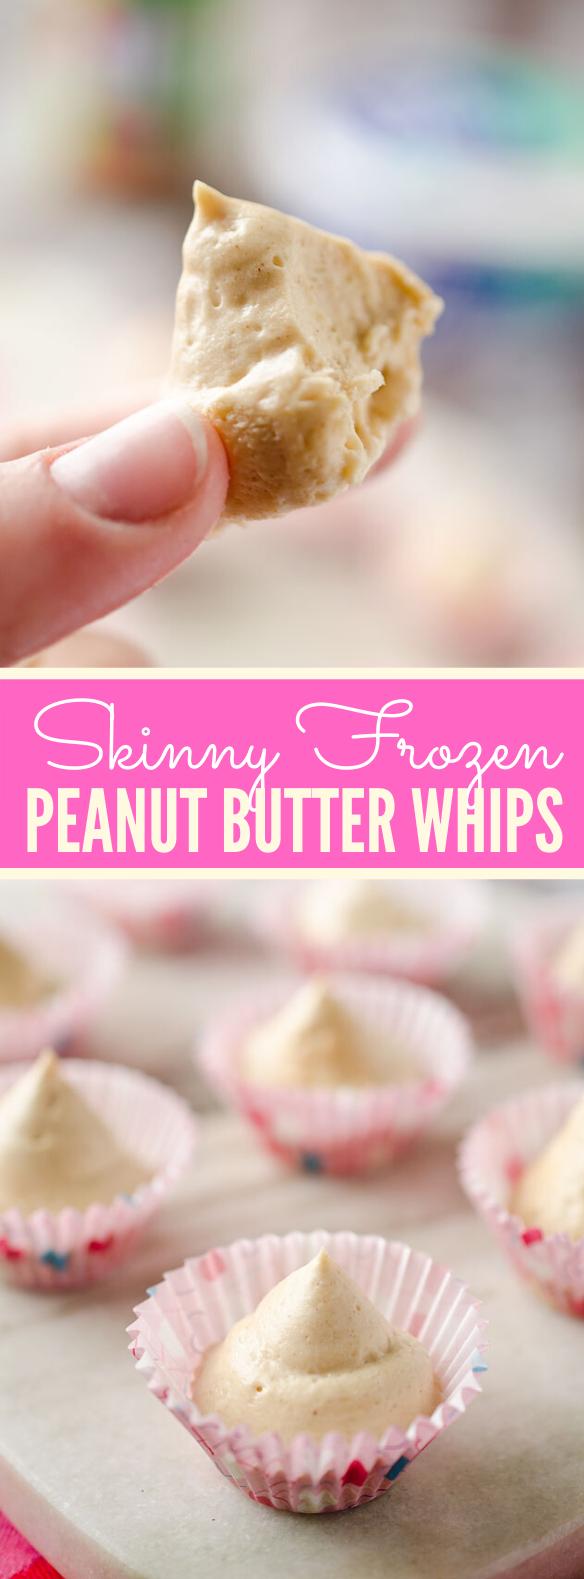 Skinny Frozen Peanut Butter Whips #desserts #lowcalorie